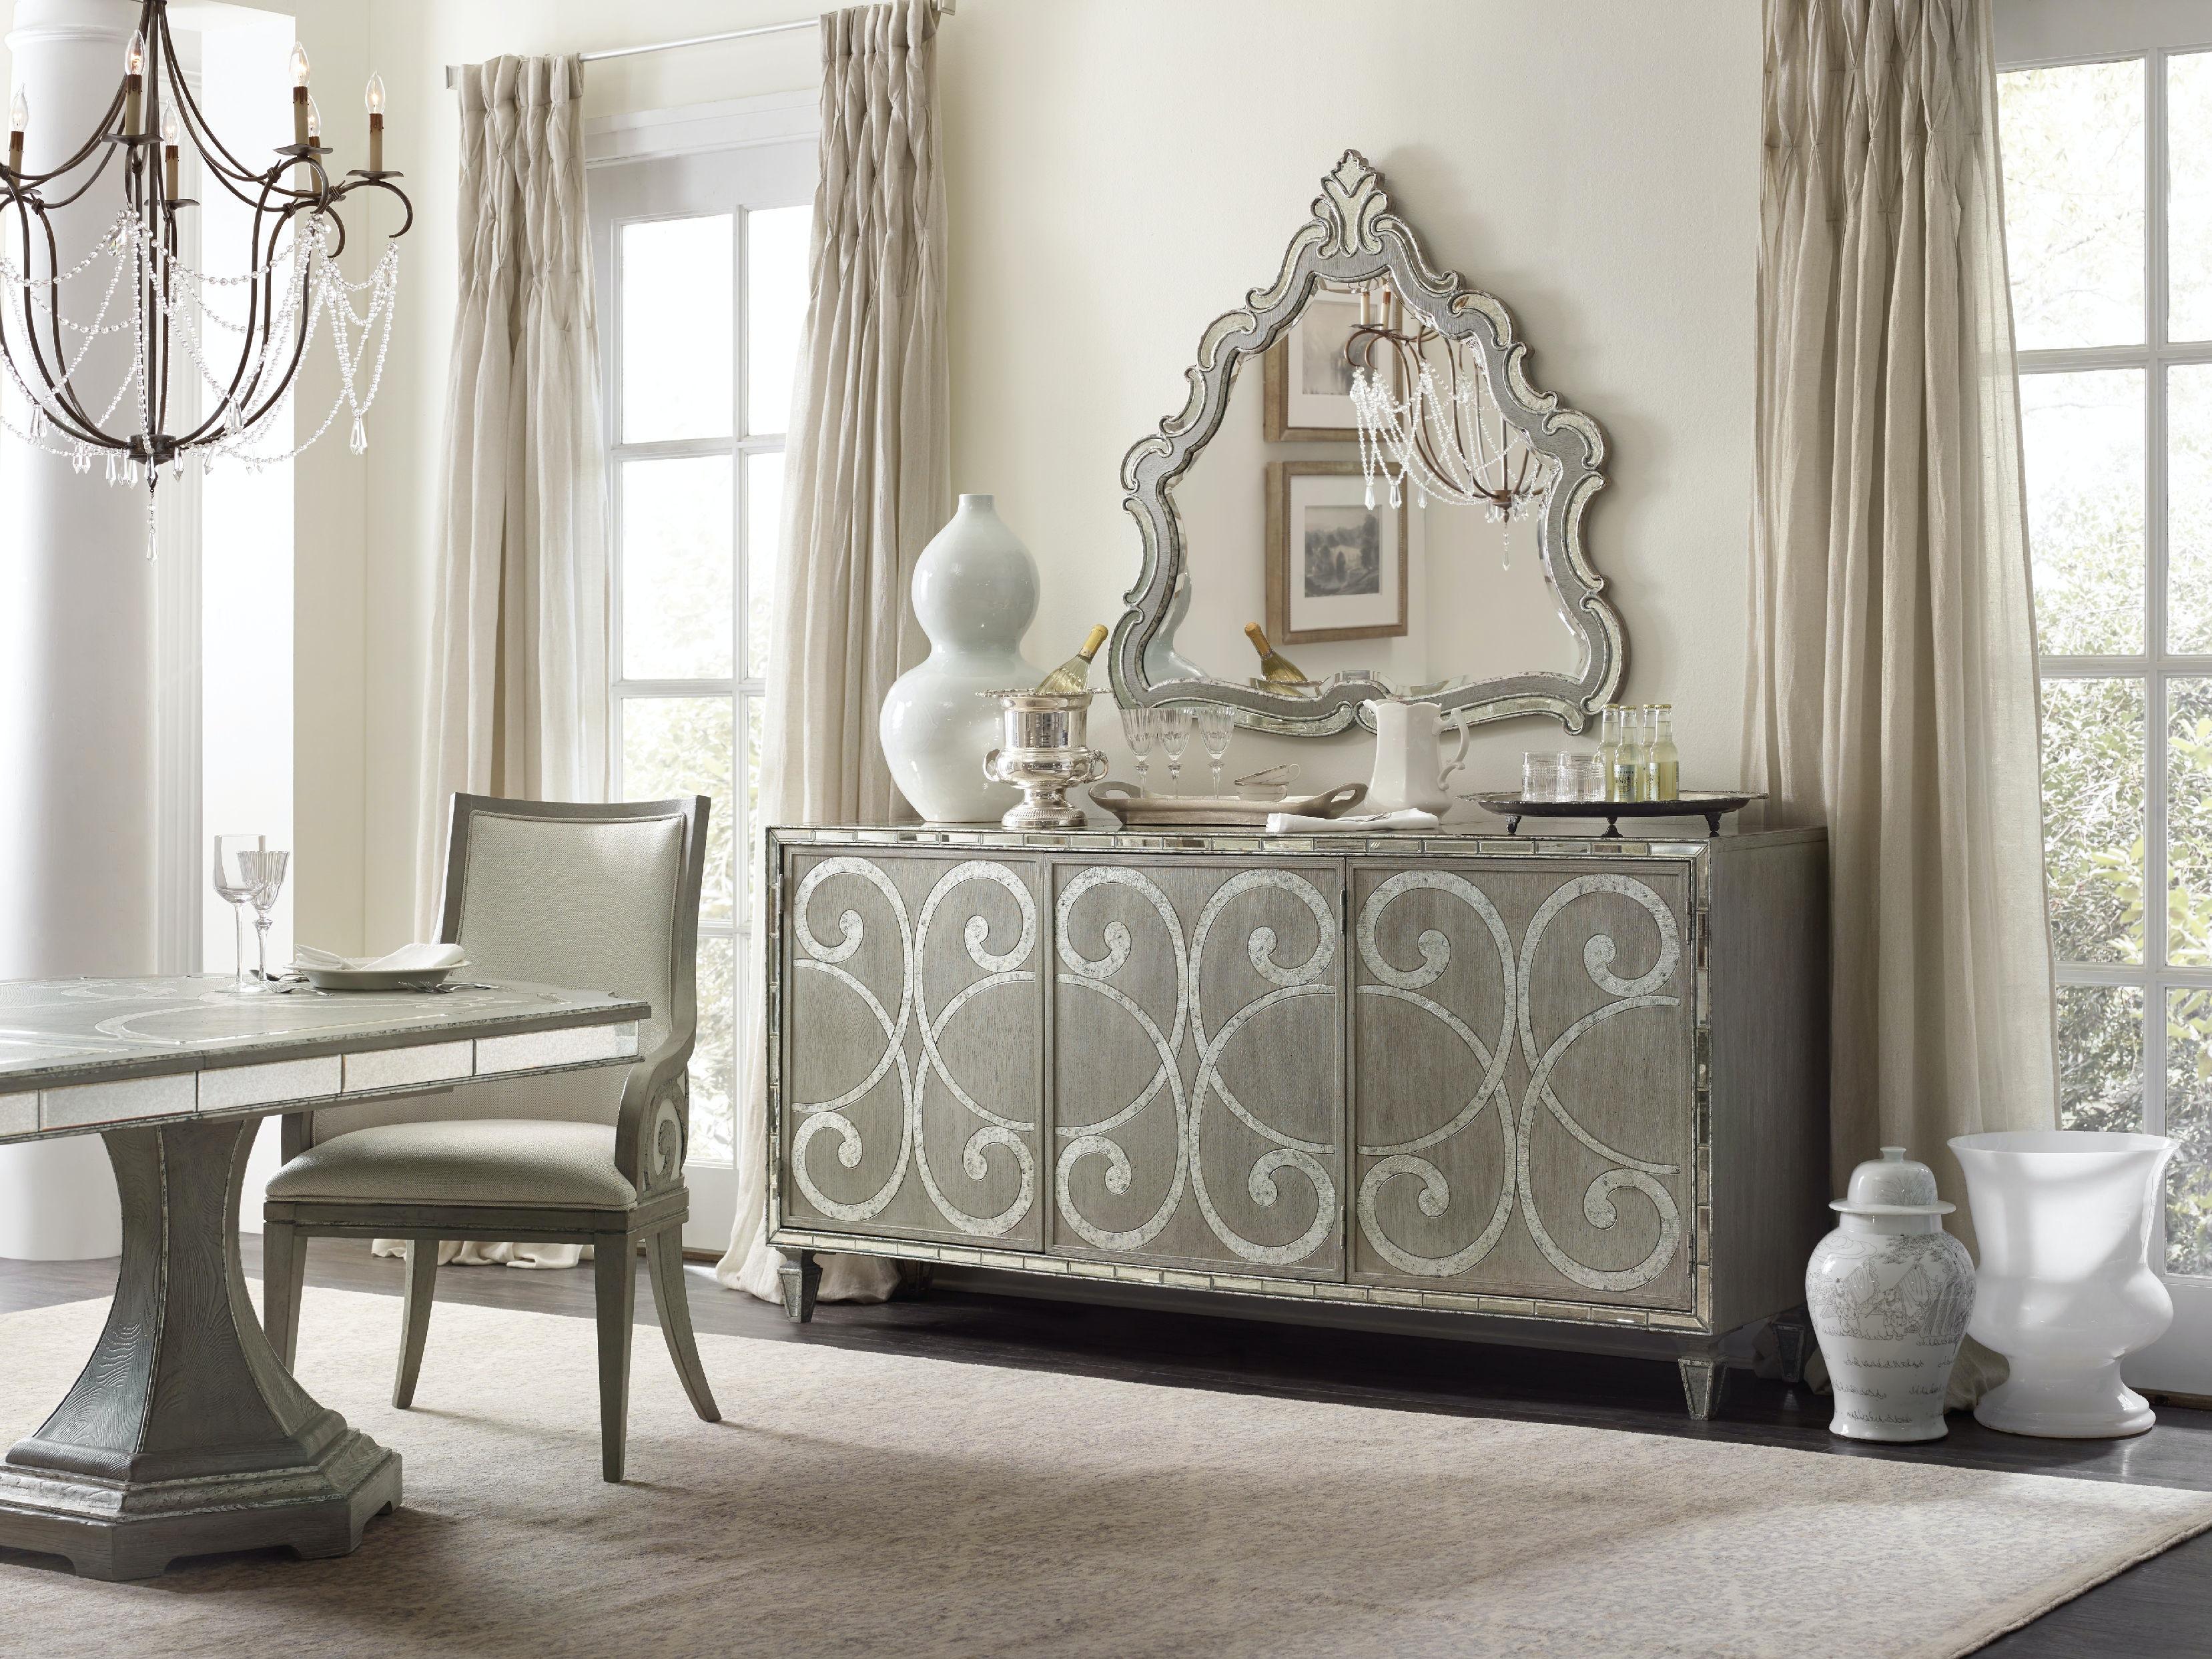 Hooker Furniture Sanctuary Buffet 5603 75900 LTBR